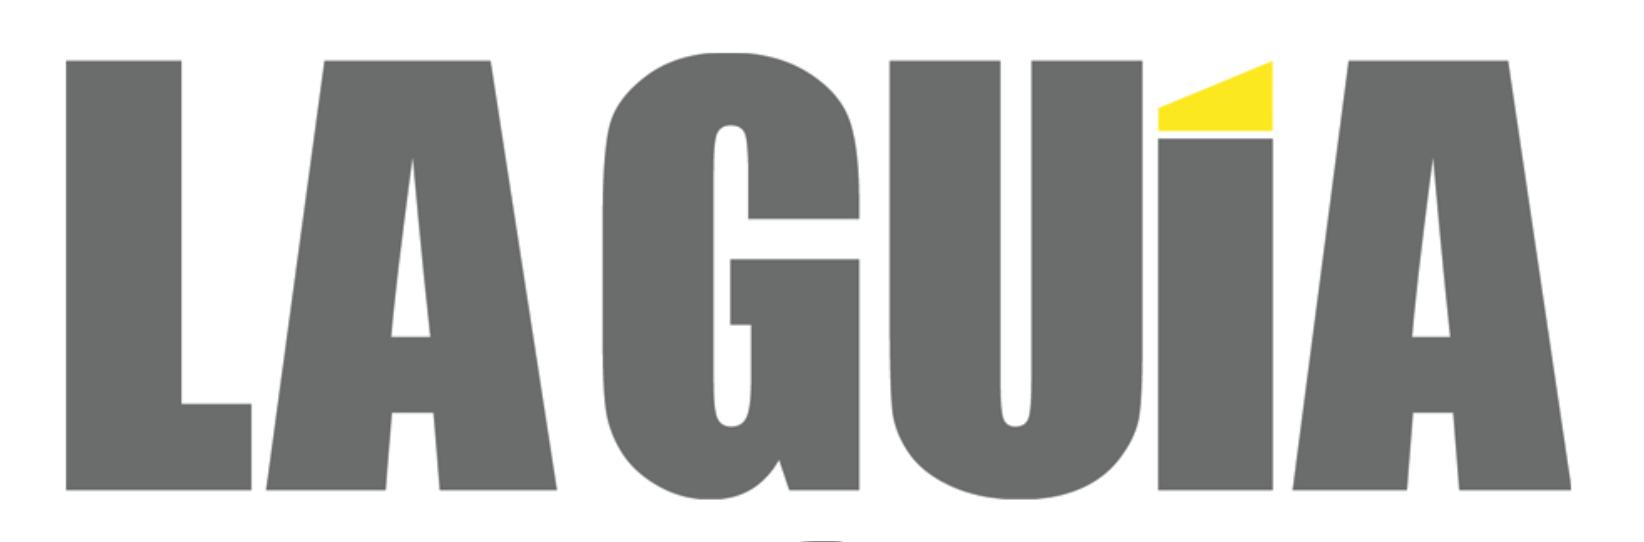 La Guia Magazine, Tampa Bay's Most Successful Hispanic Publication